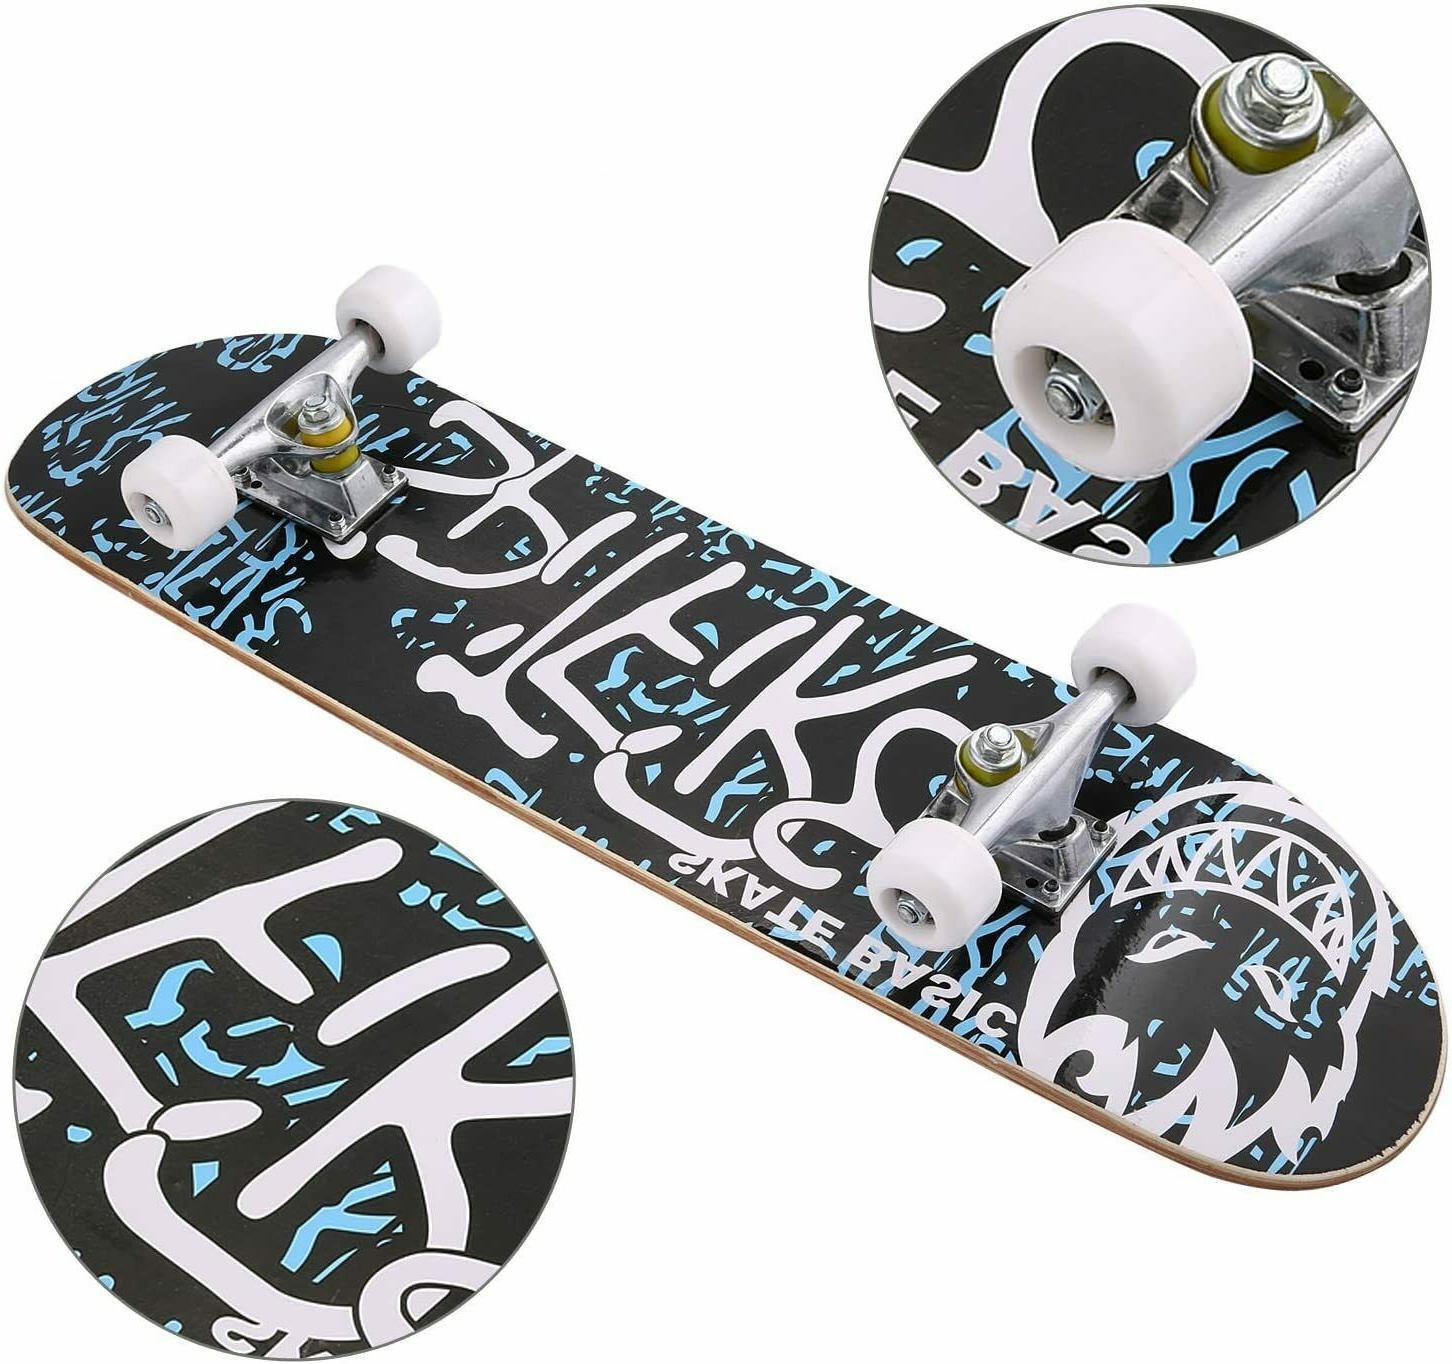 "Pro Skateboards Size Maple Deck Skateboard 31"" X 8"""